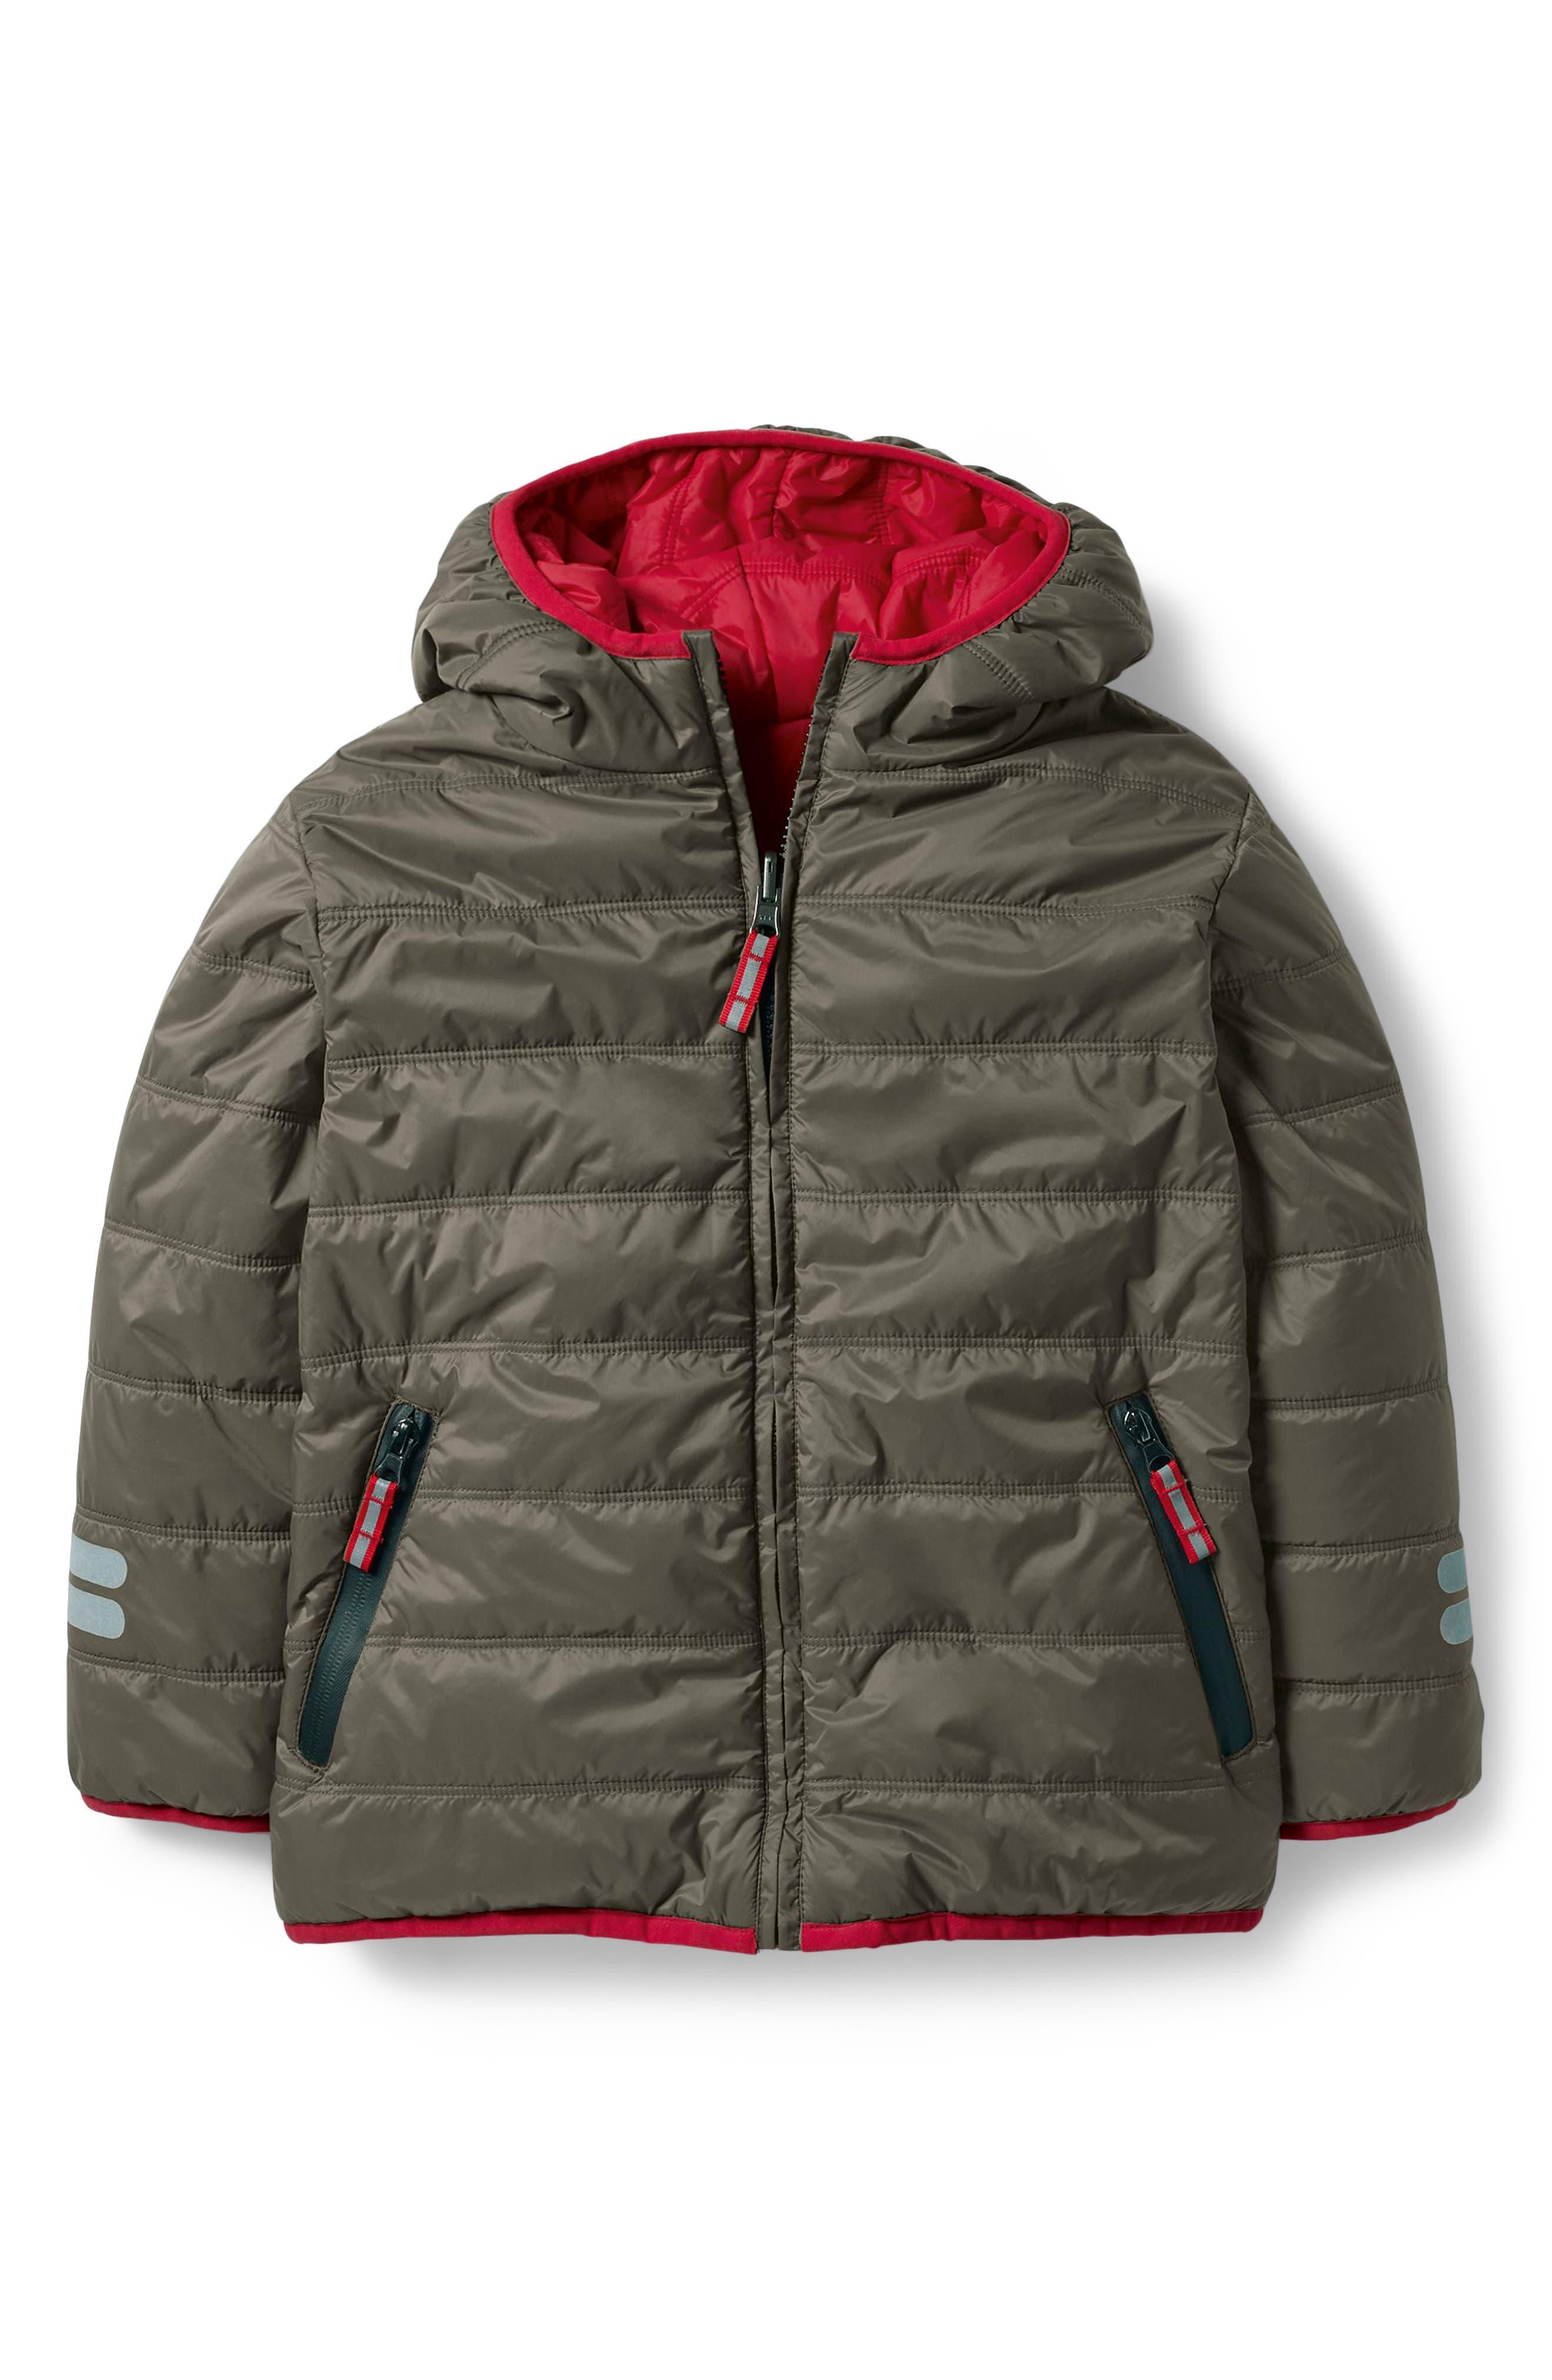 Mini Boden Chilly Days Reversible Hooded Jacket (Toddler Boys, Little Boys & Big Boys)